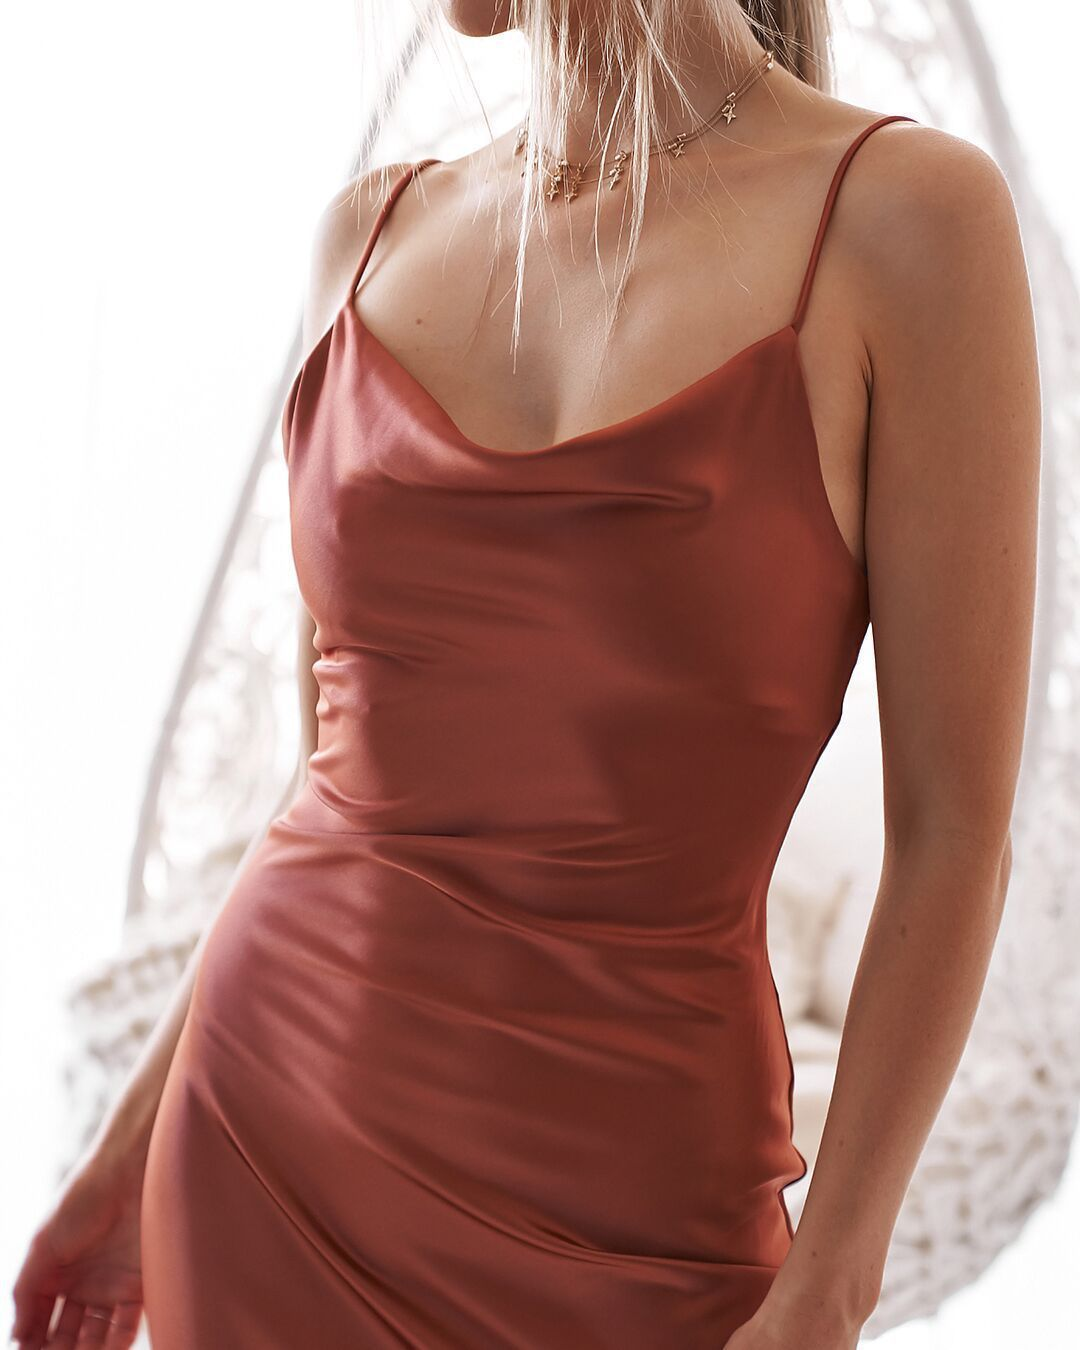 Silk Cowl Neck Slip Dress Burnt Orange Cami Slip Dress Satin Cami Dress Fitted Night Party Dresses Clas Party Dress Classy Satin Dress Long Orange Prom Dresses